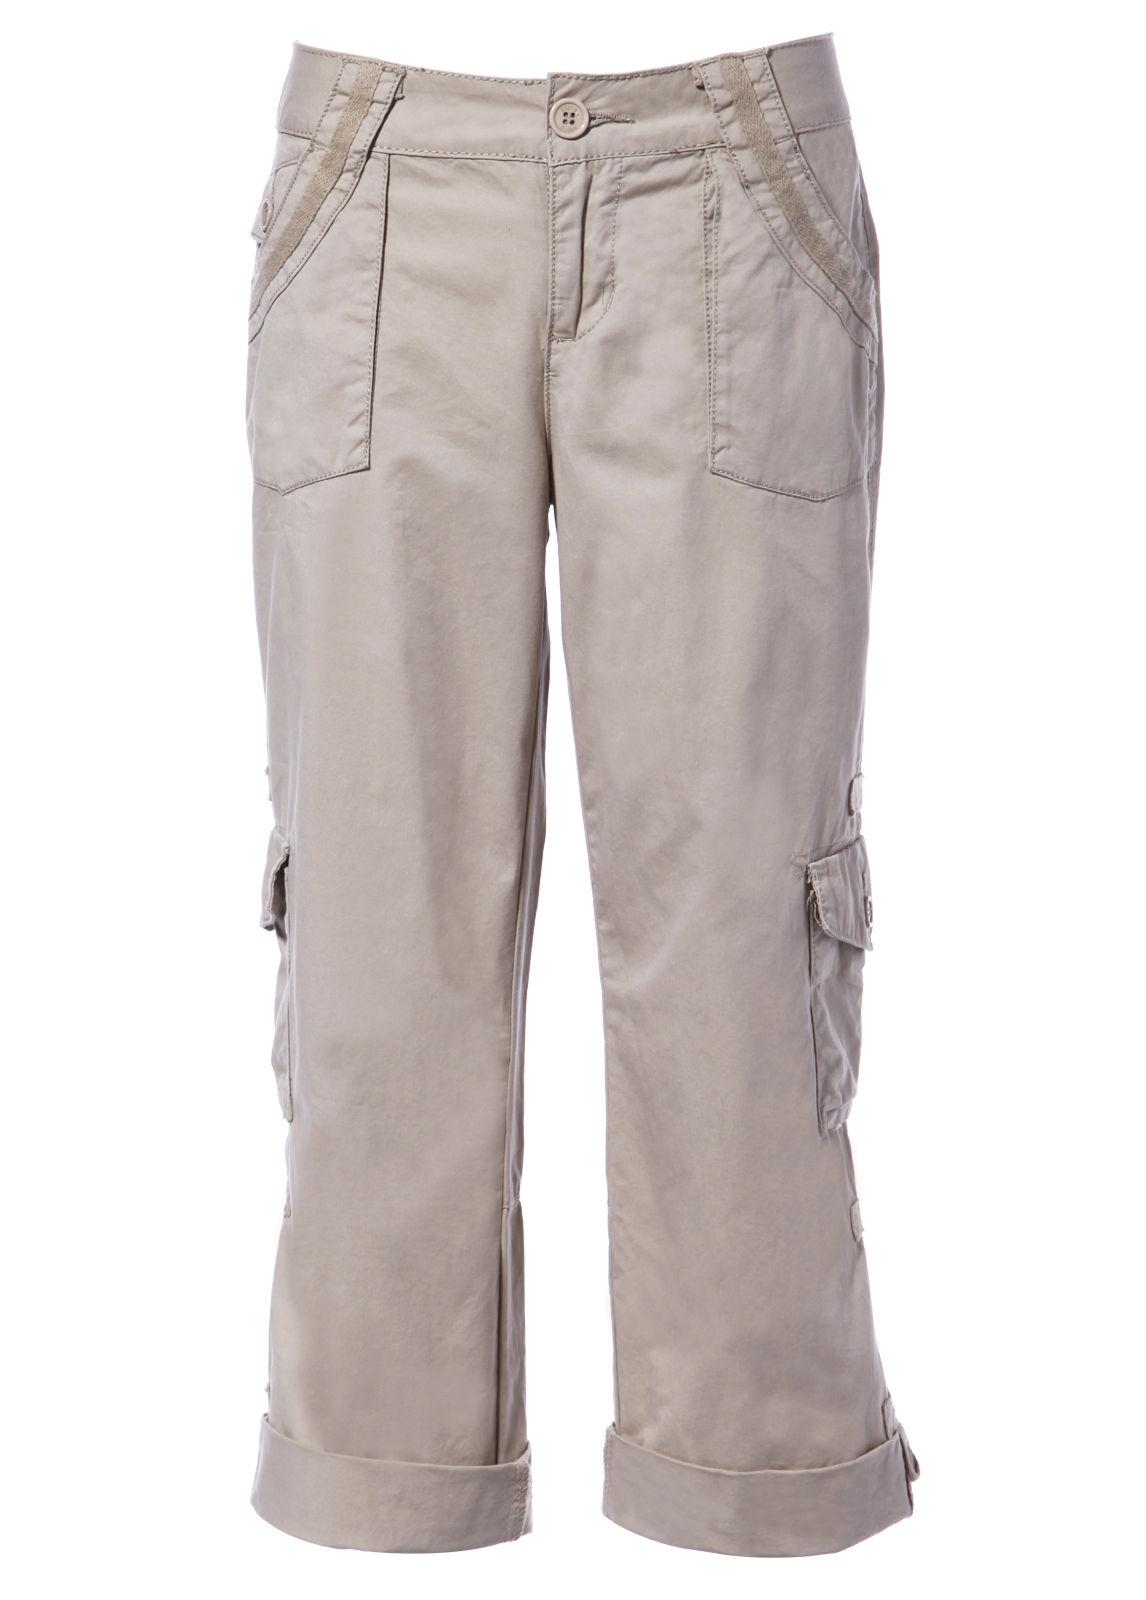 Fantastic  4424 Same Style Various Colors Tan Pants Navy Blue Pants Black Pants